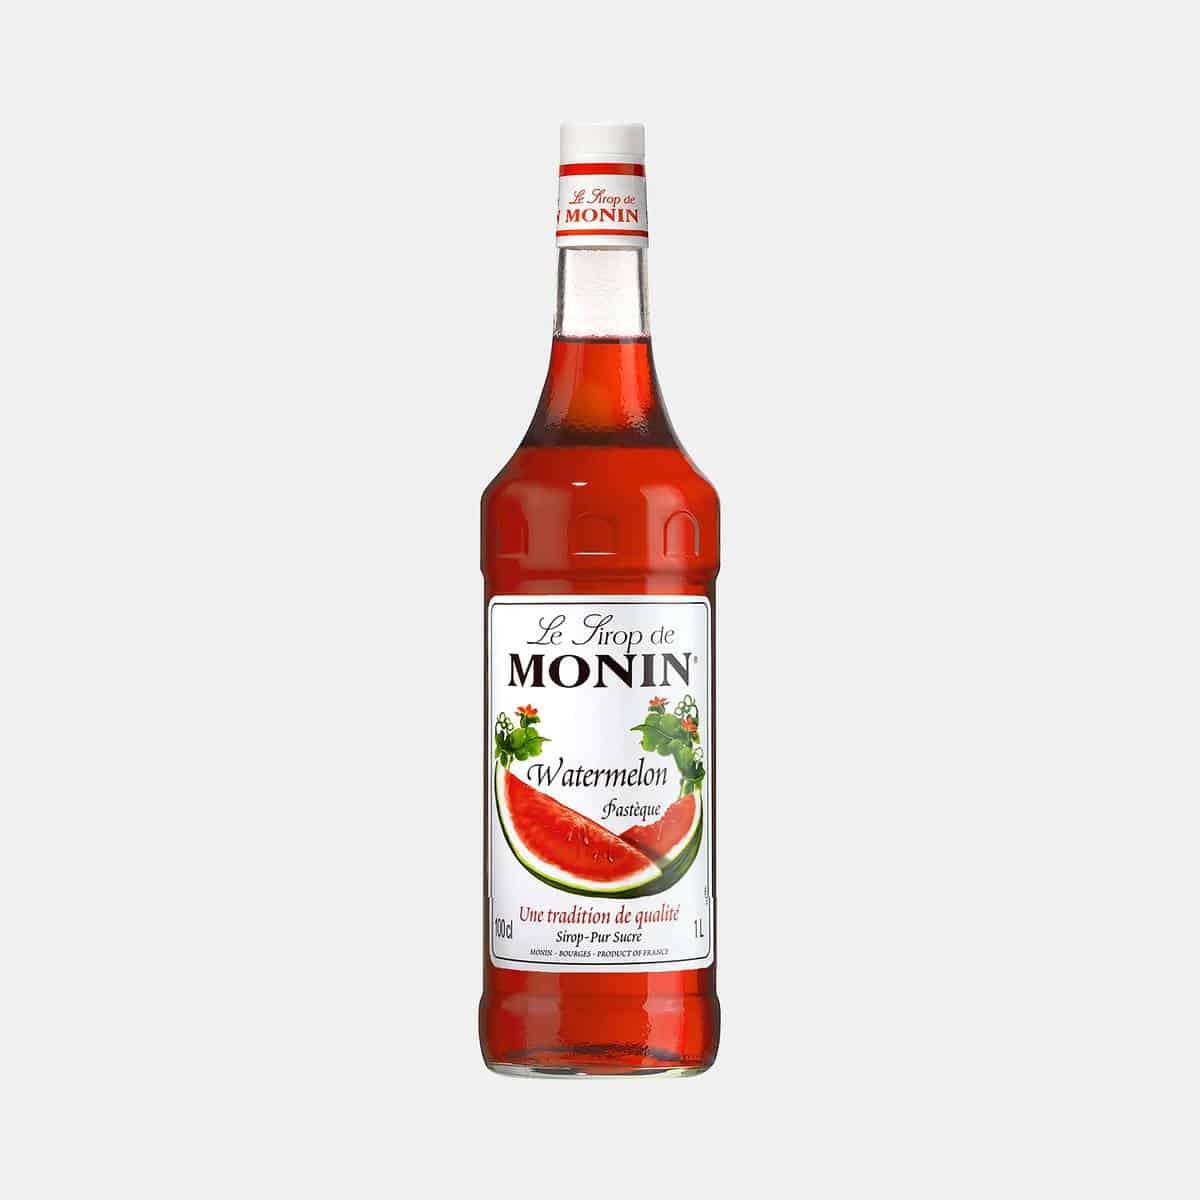 Monin Watermelon Syrup 1L Glass Bottle